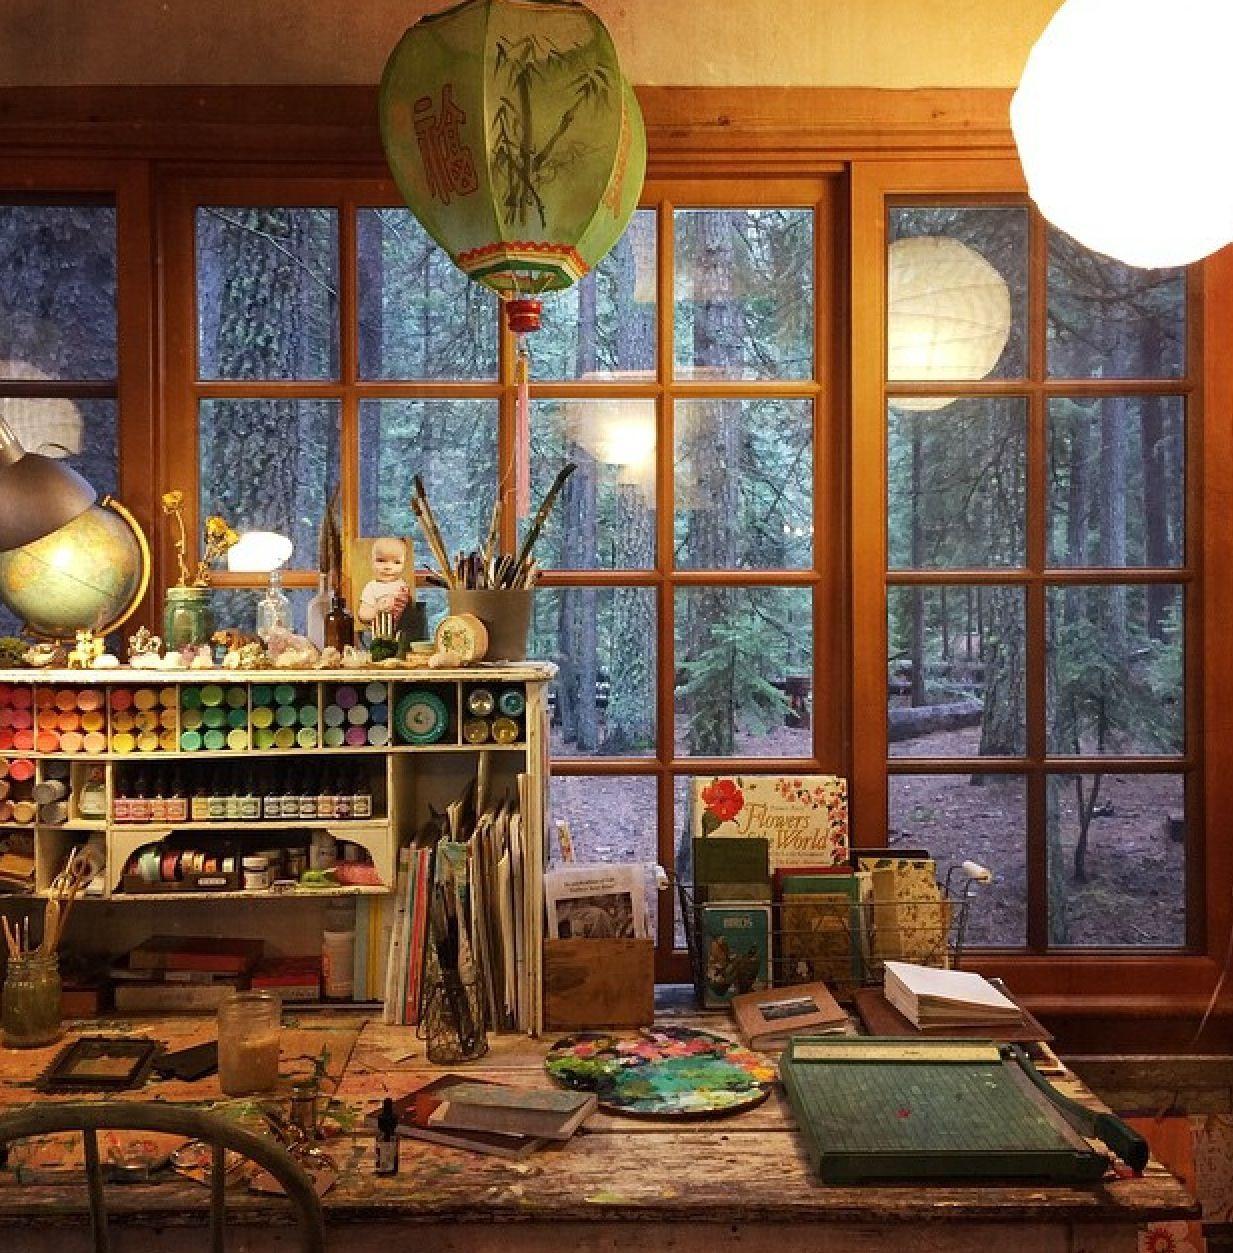 ART - Work Rooms And Studios In